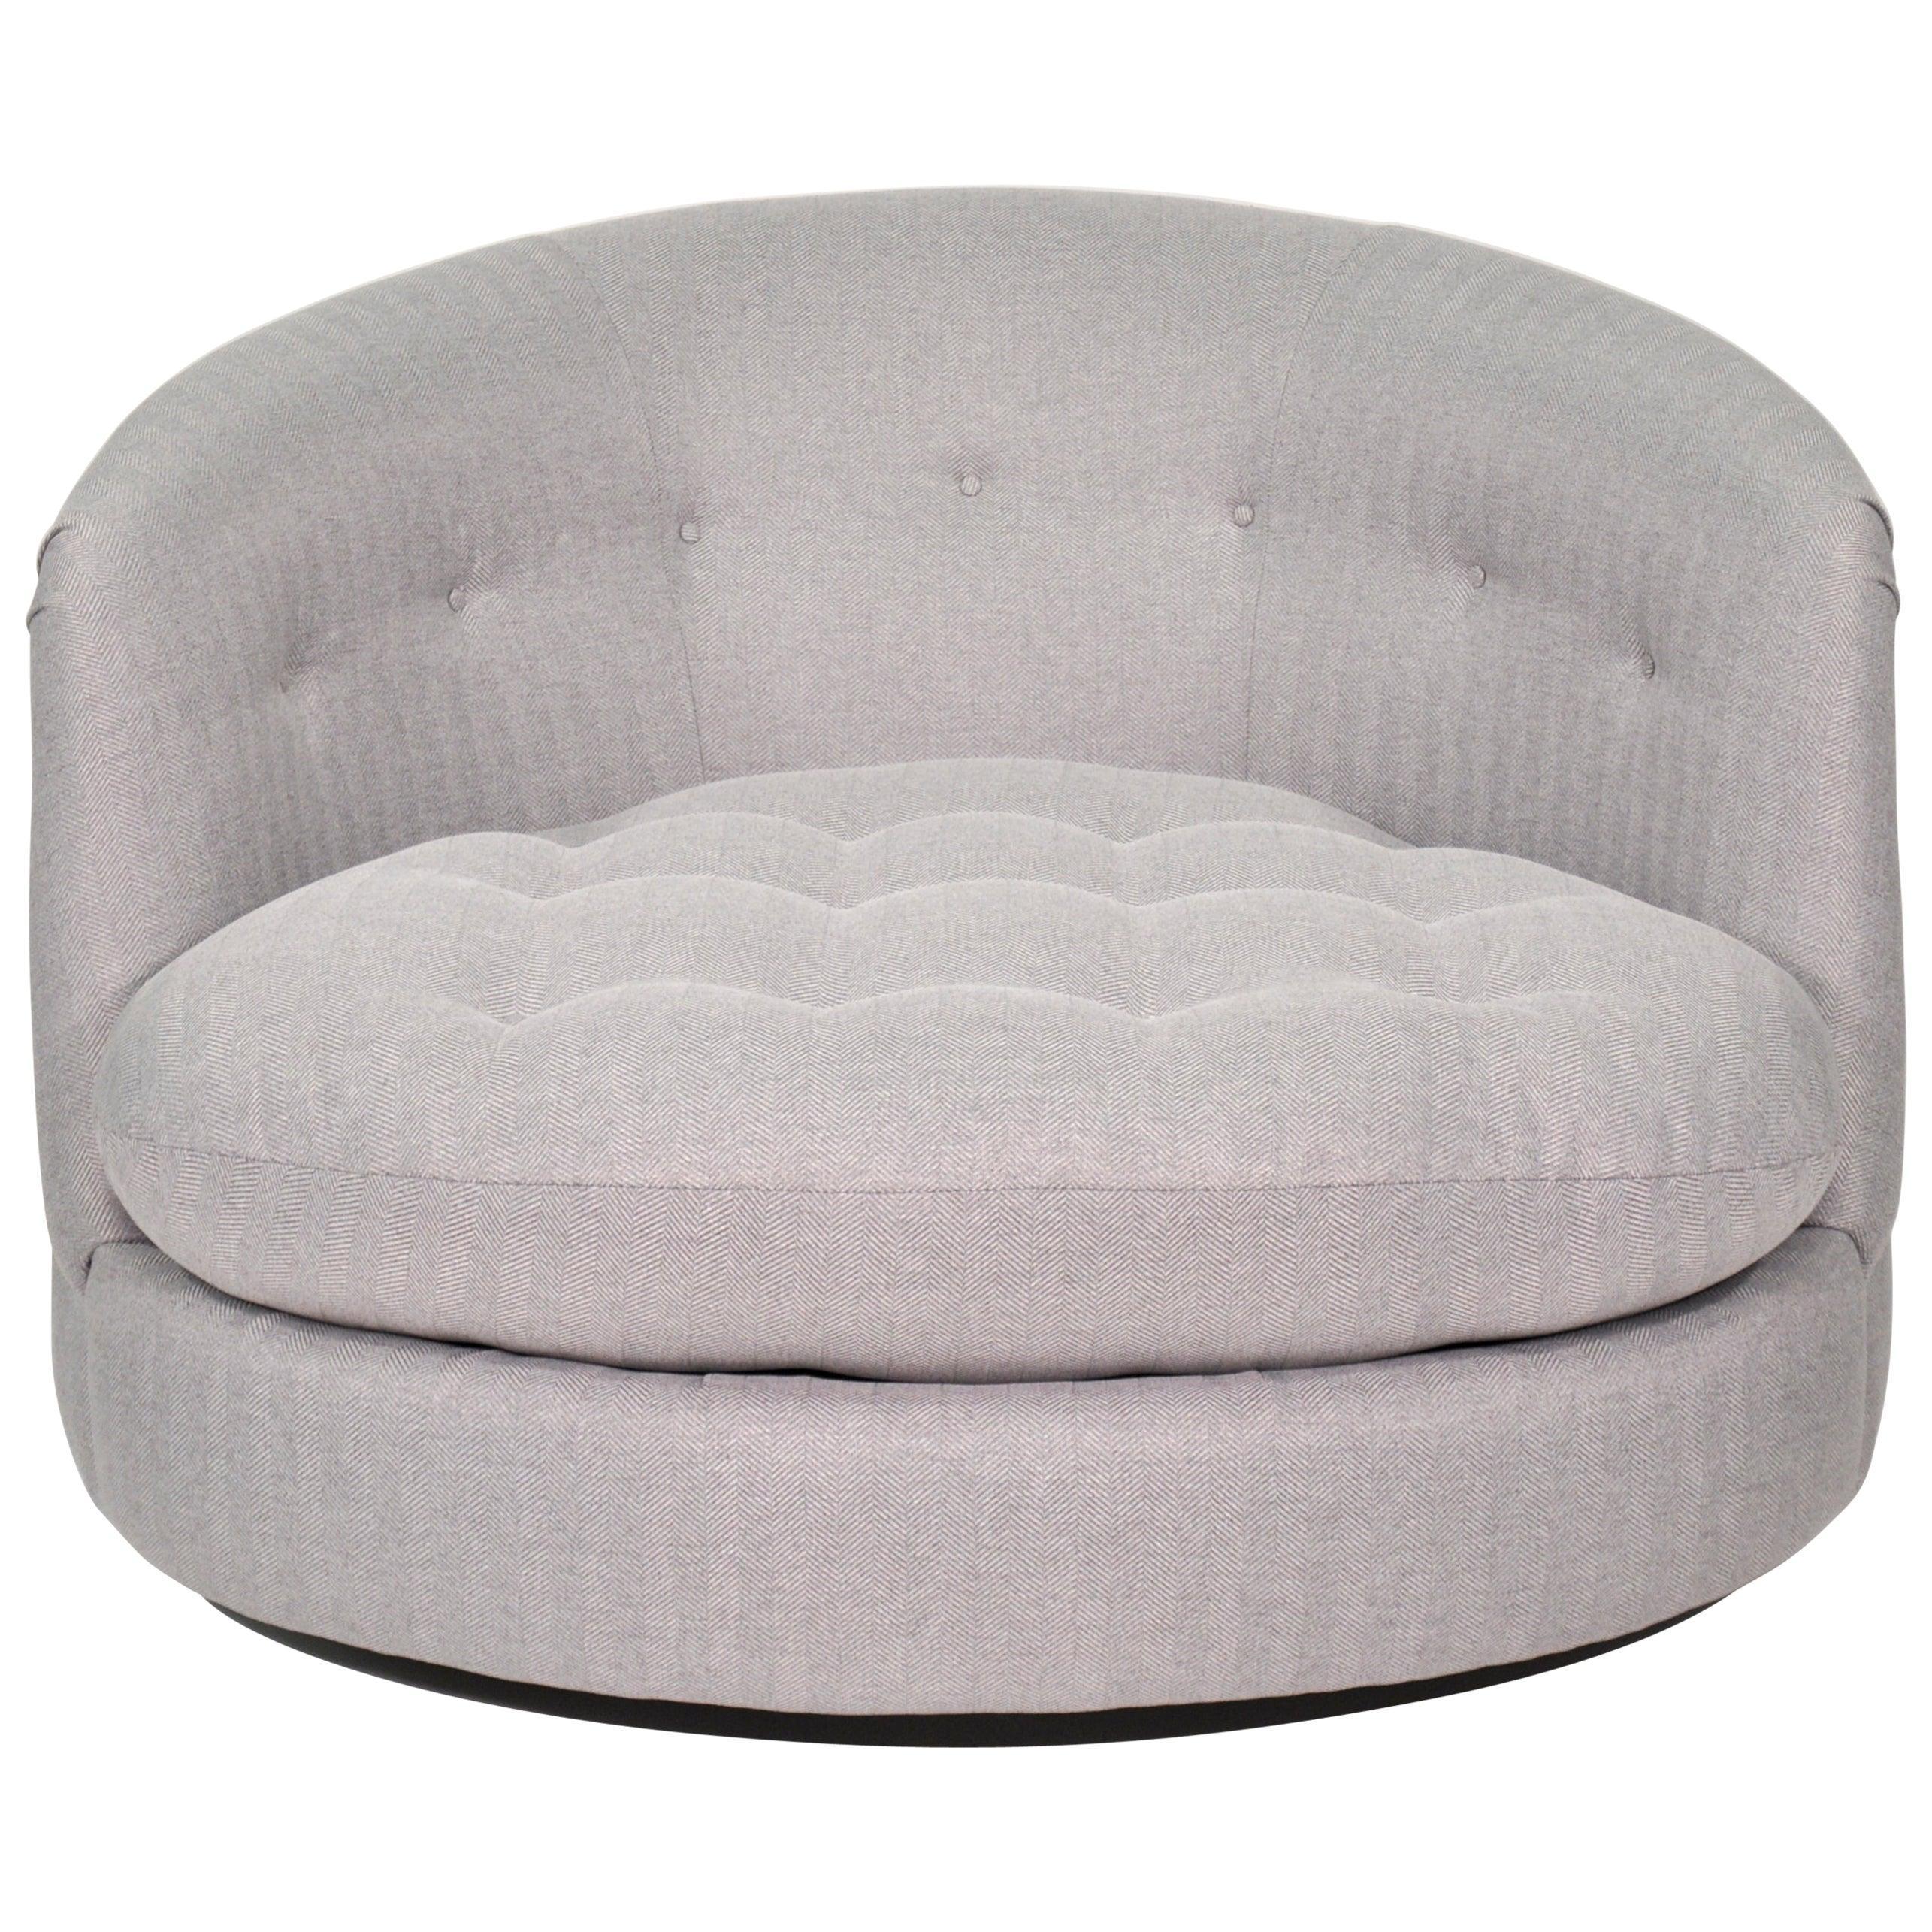 Milo Baughman for Thayer Coggin Swivel Tub Chair